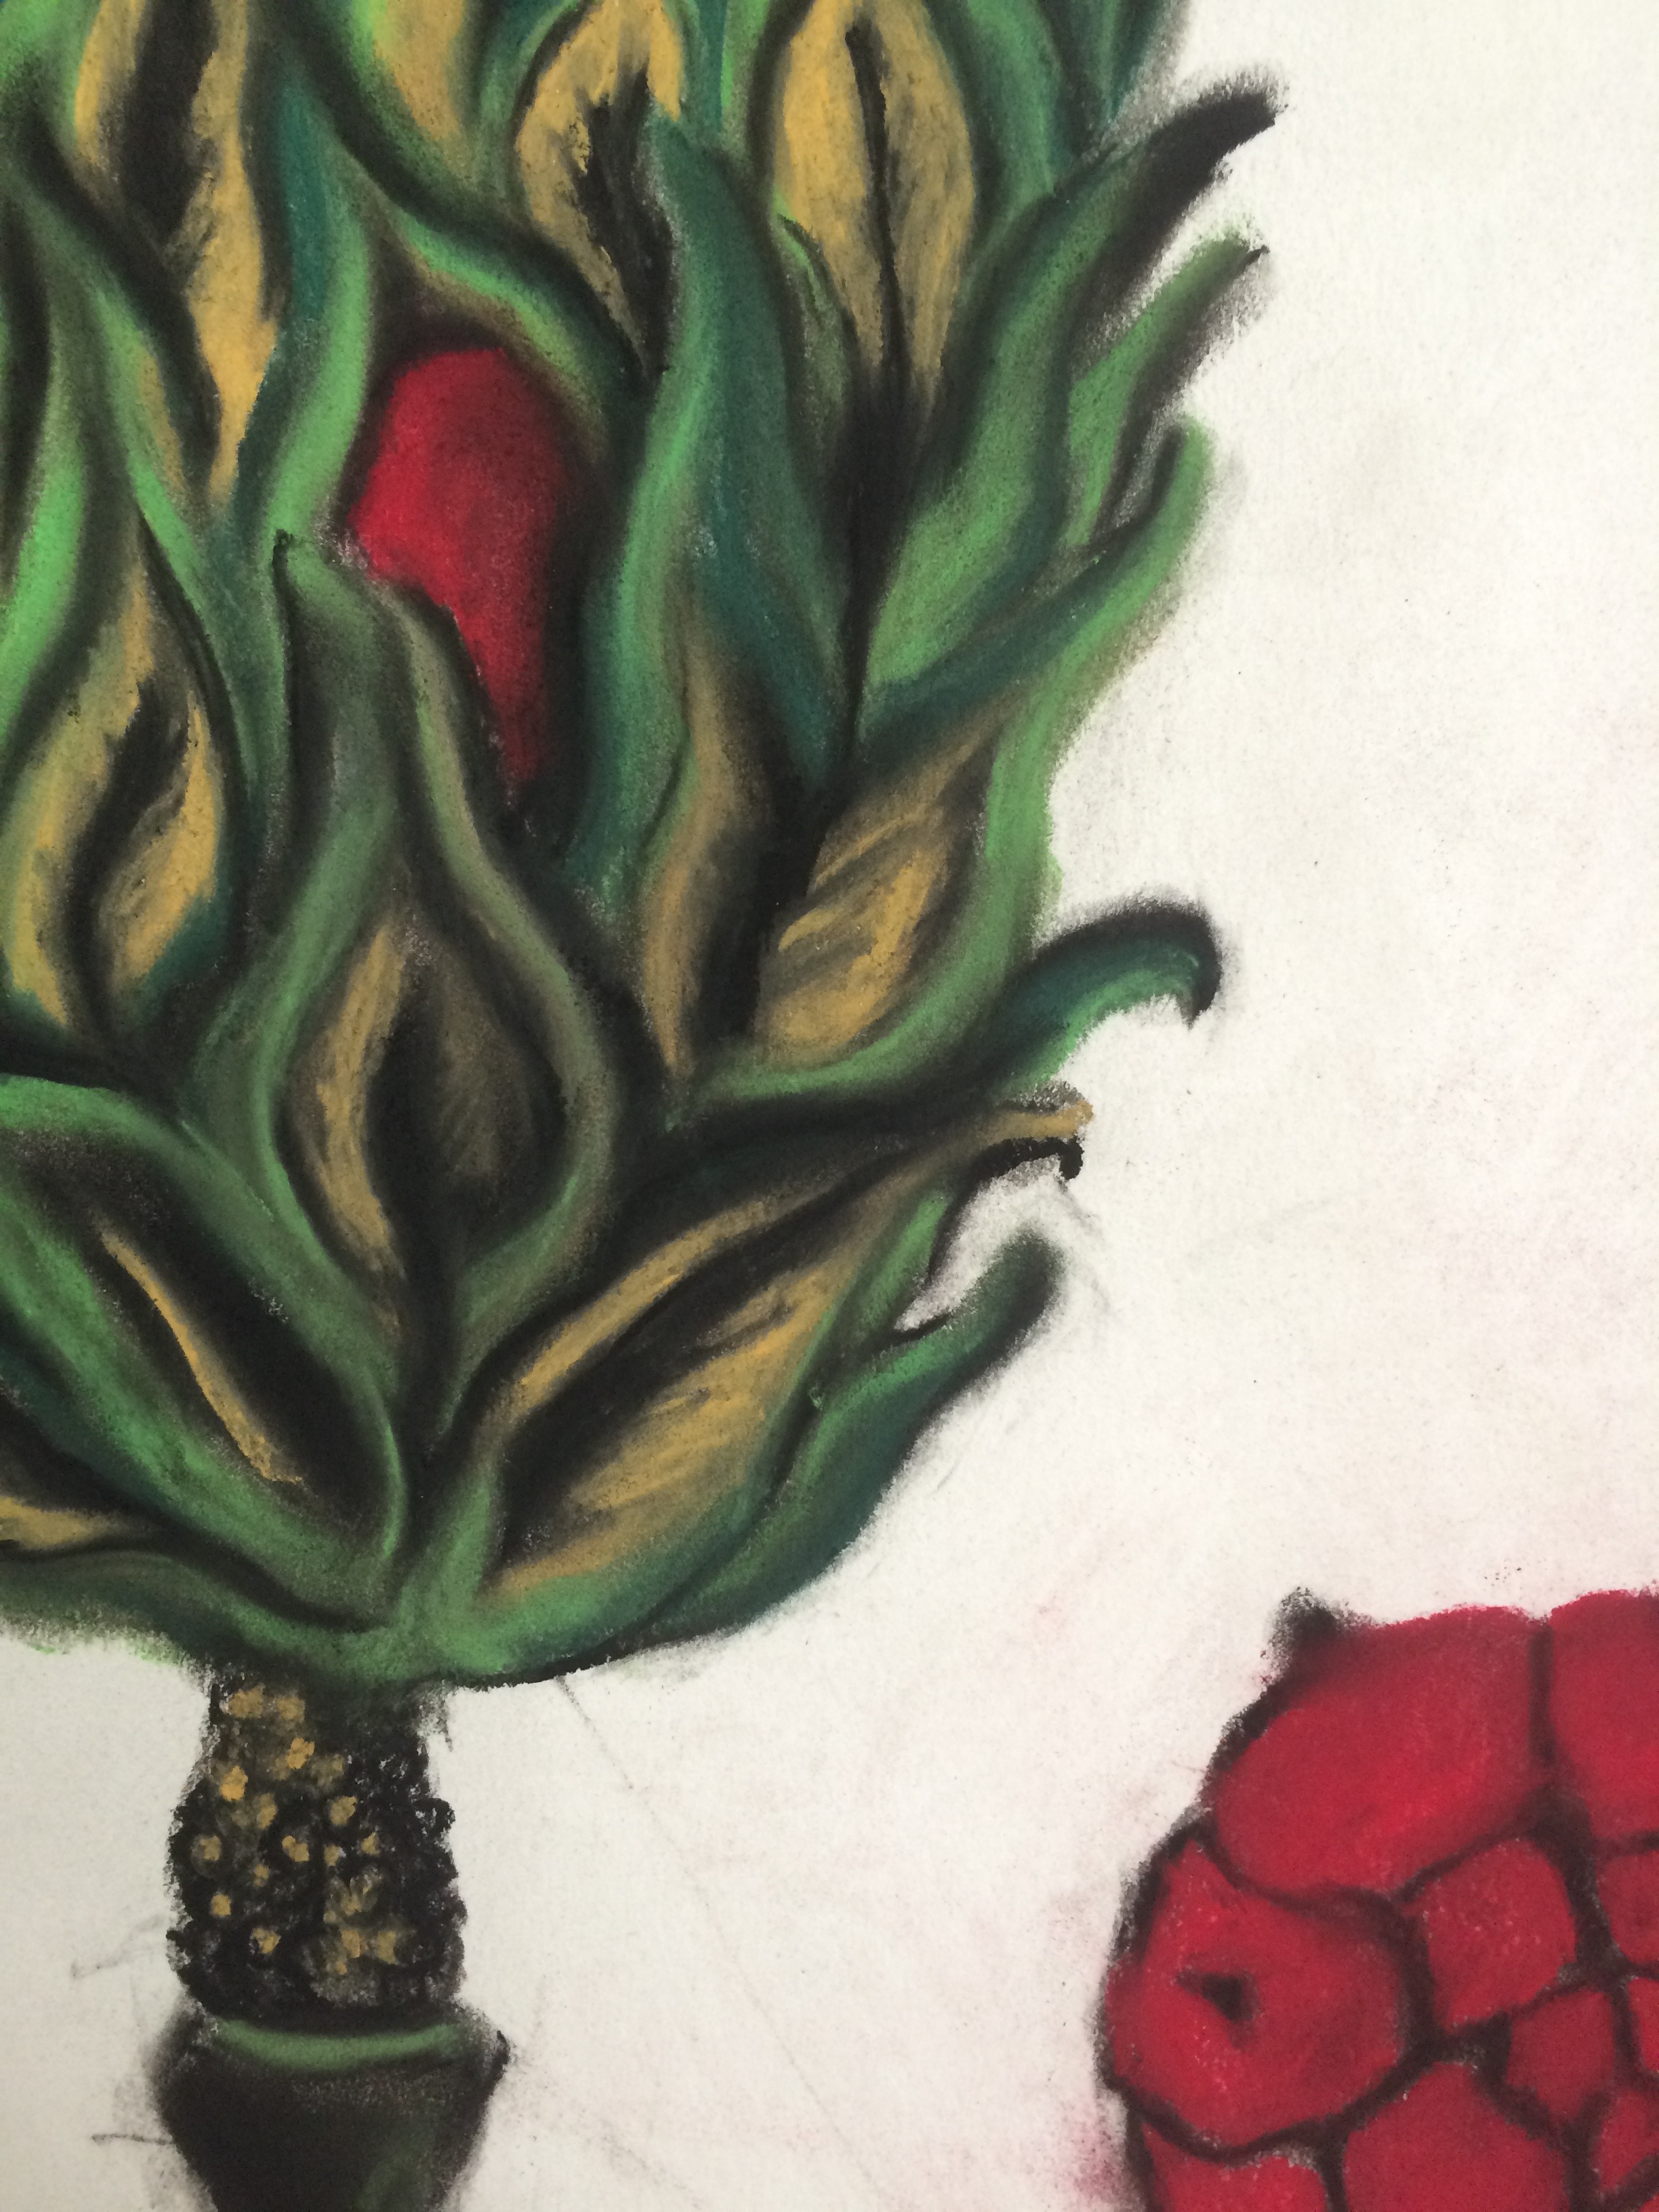 Green Pod Red Pod detail